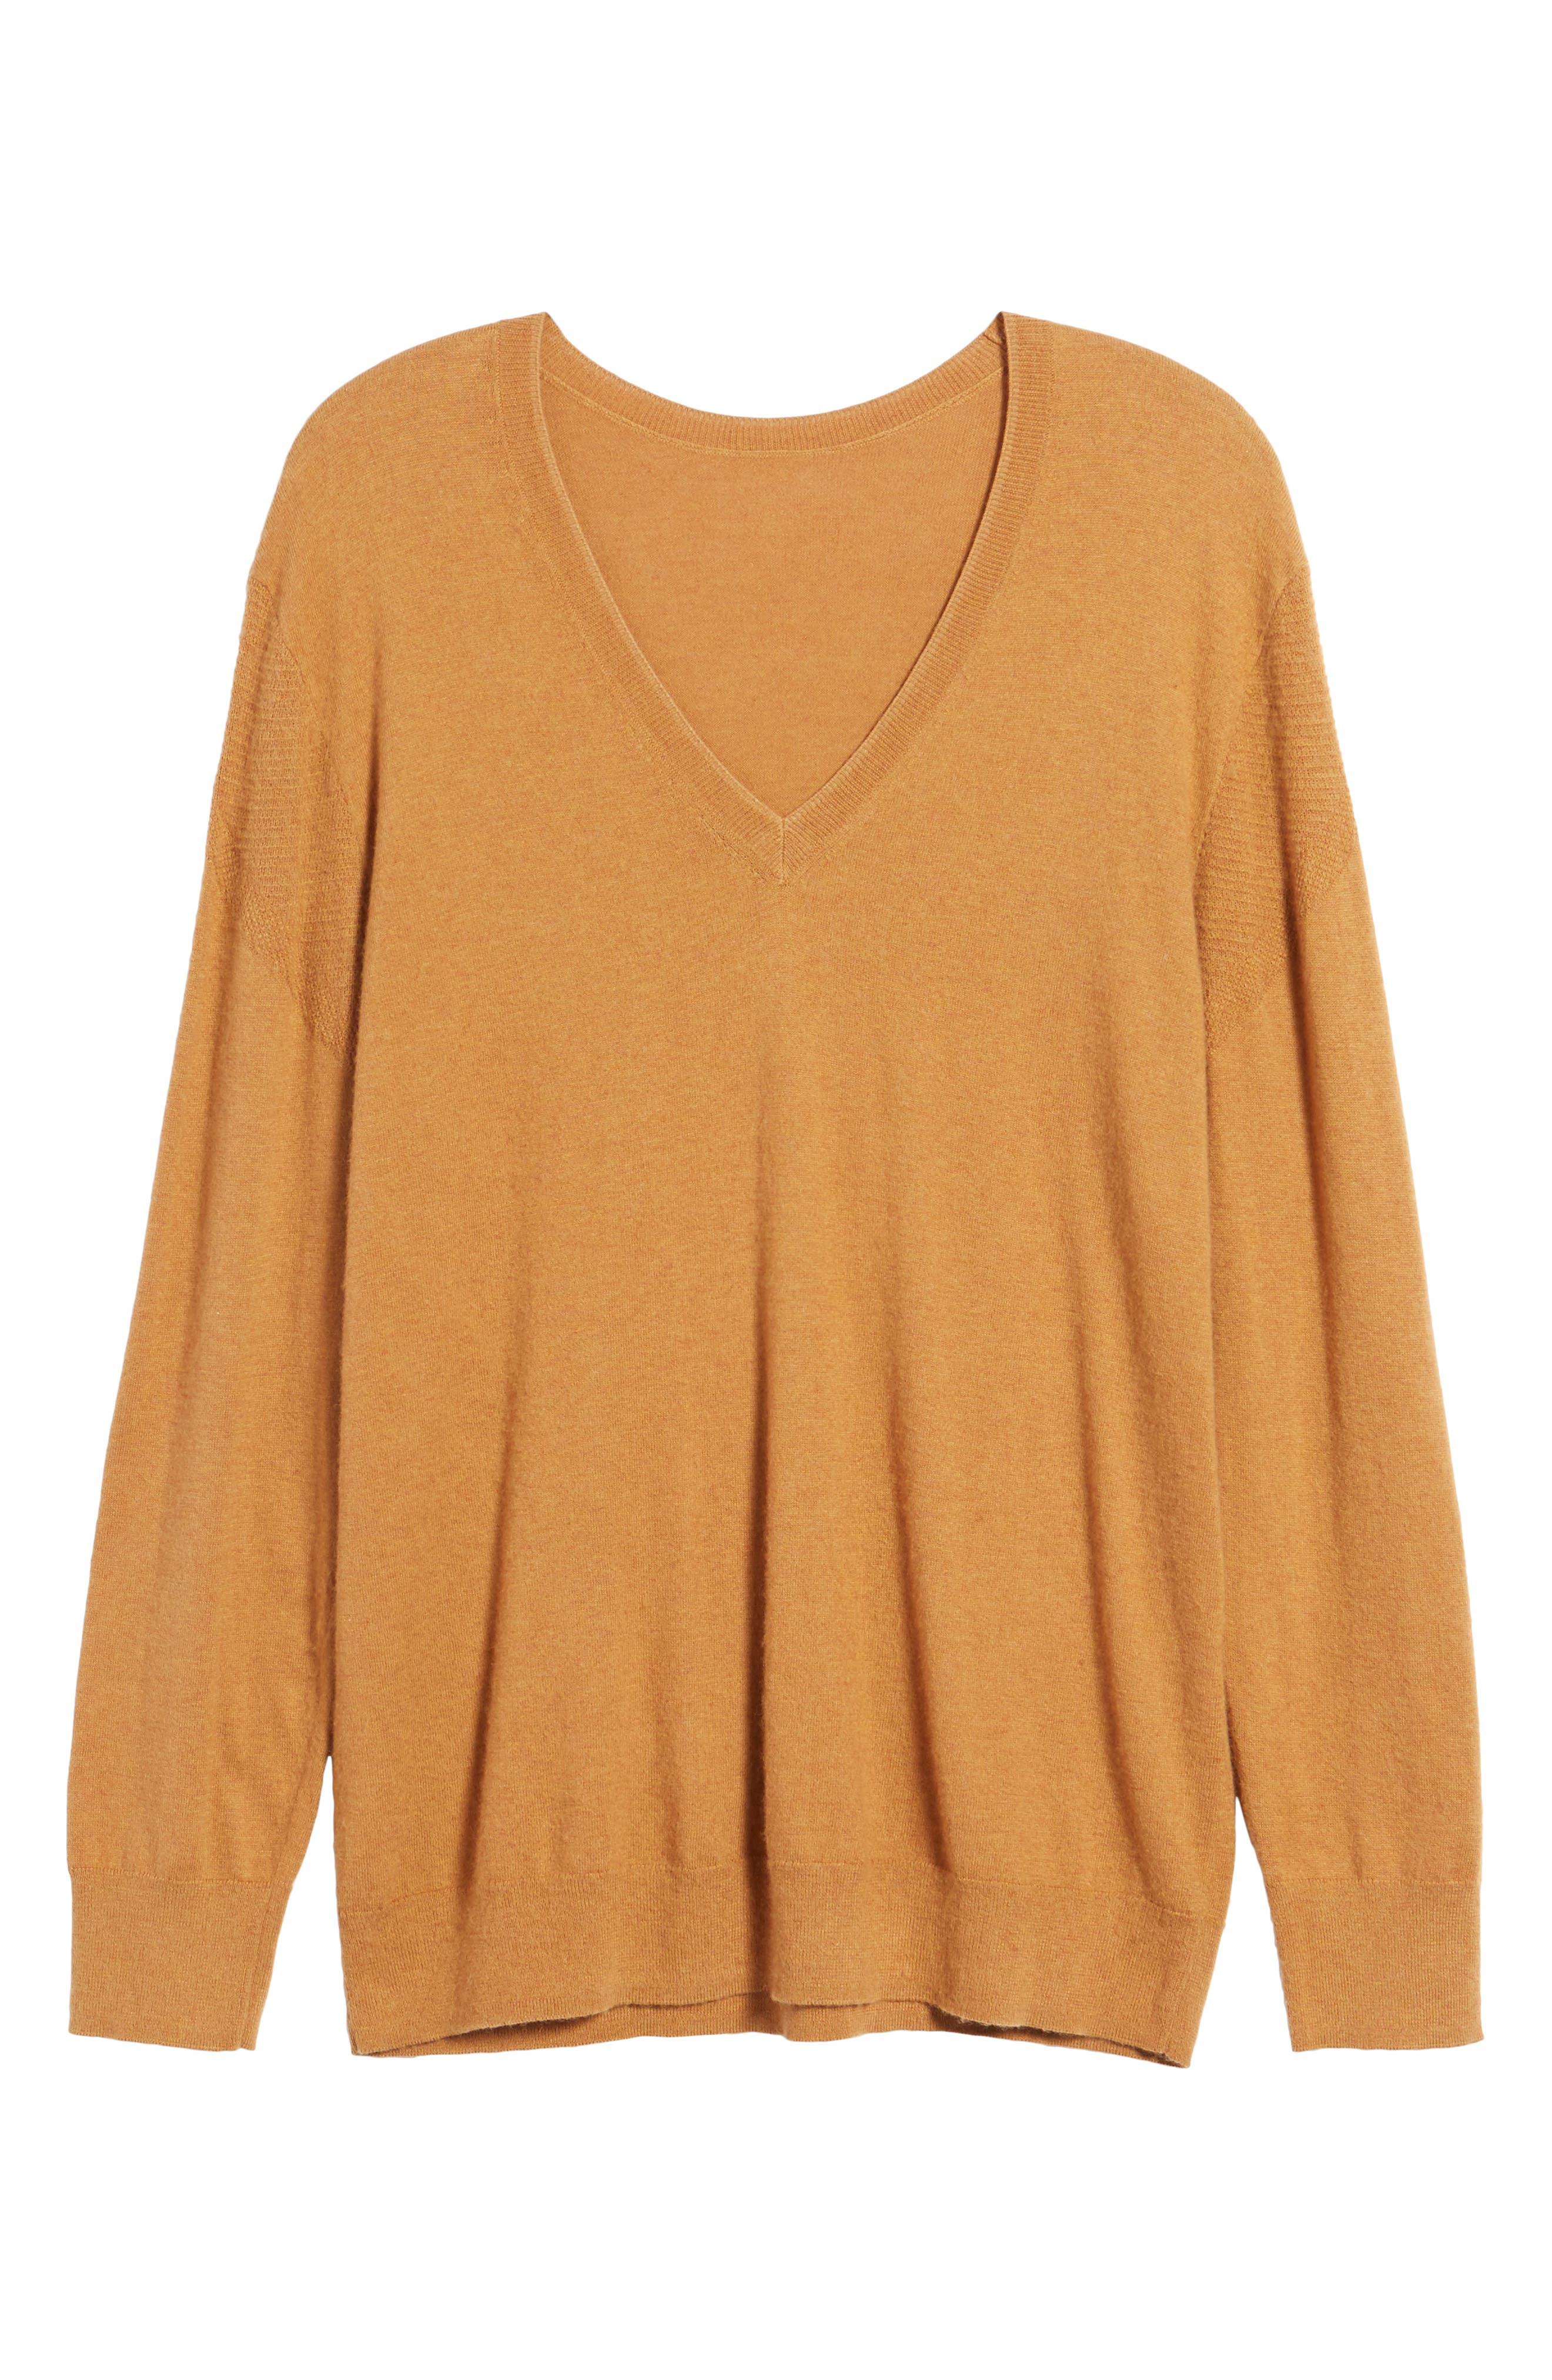 V-Neck Sweater,                             Alternate thumbnail 6, color,                             Tan Sugar Heather